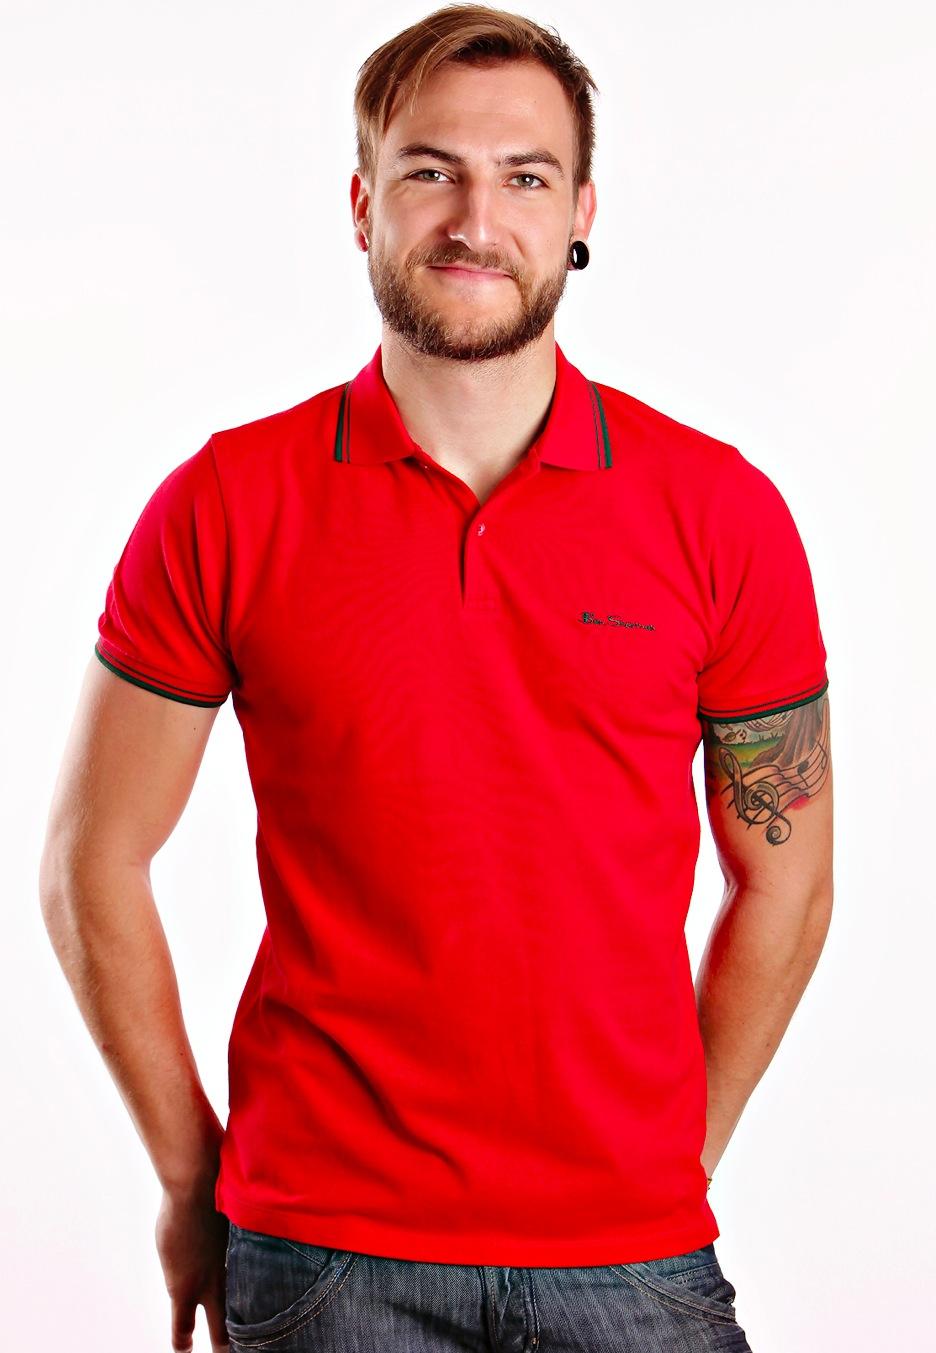 ben sherman s s pique mars red polo streetwear shop worldwide. Black Bedroom Furniture Sets. Home Design Ideas